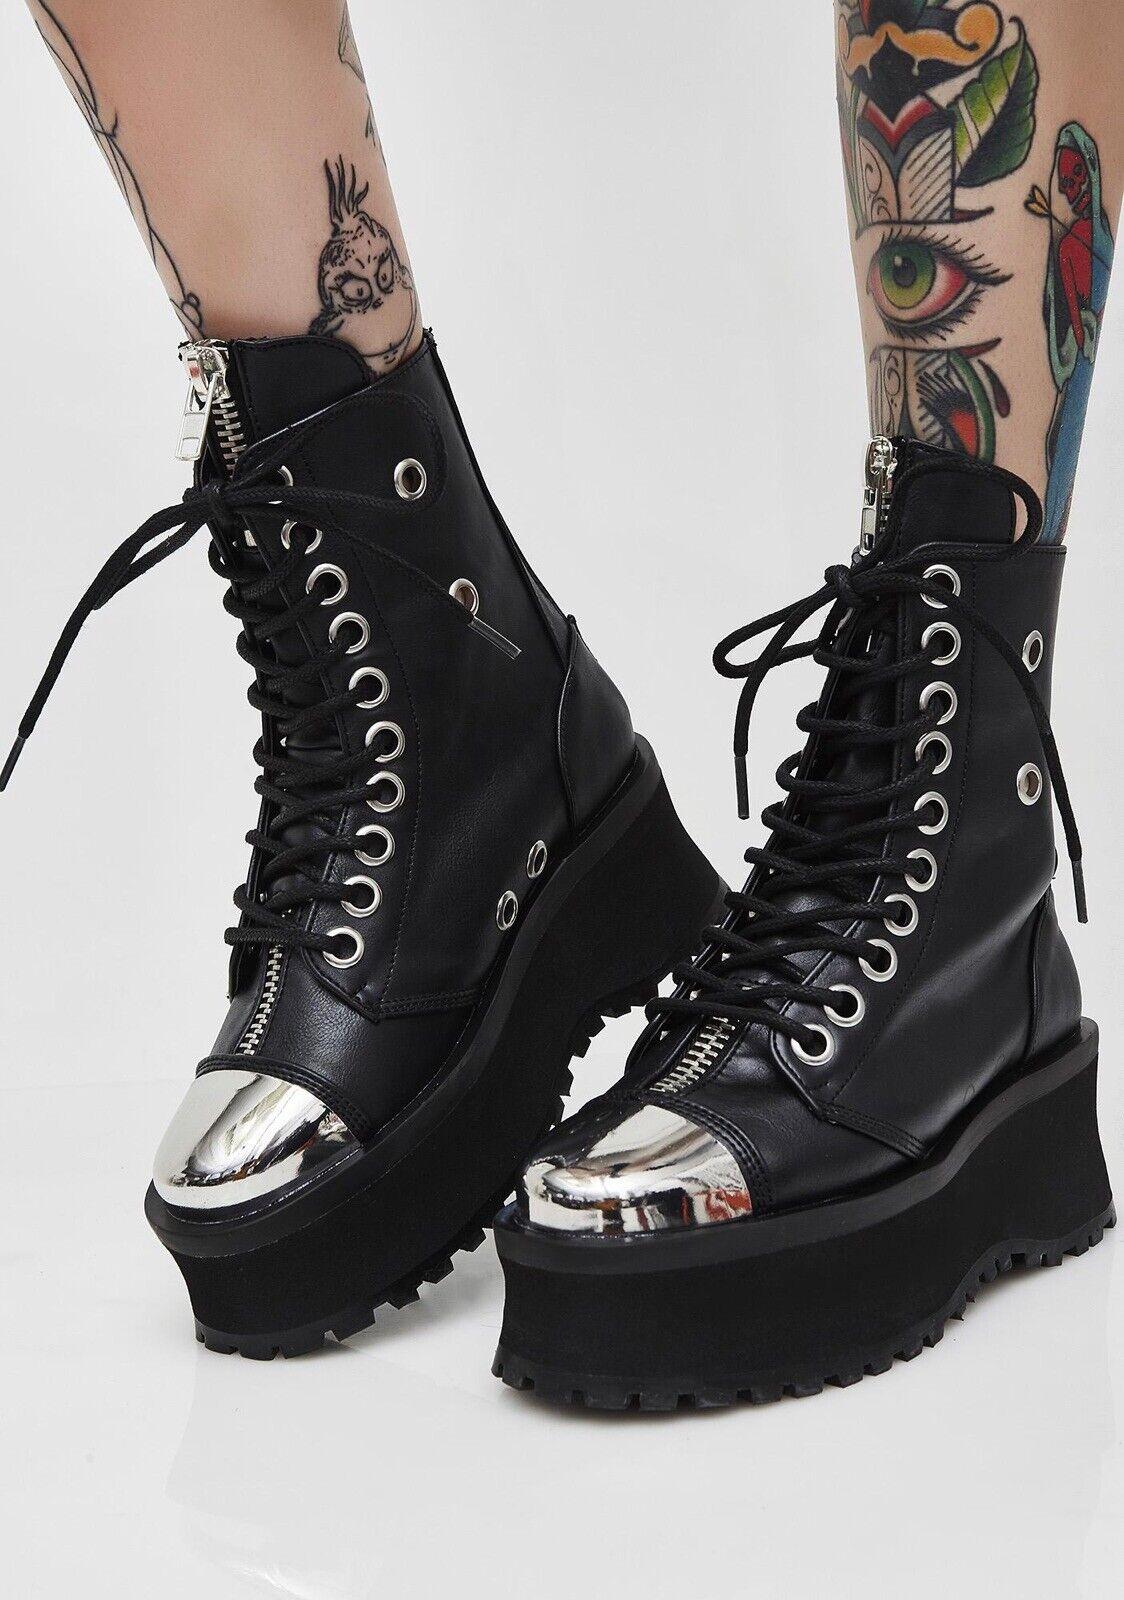 Demonia Gravedigger 10 para hombre de combate Puntera botas para mujer 6